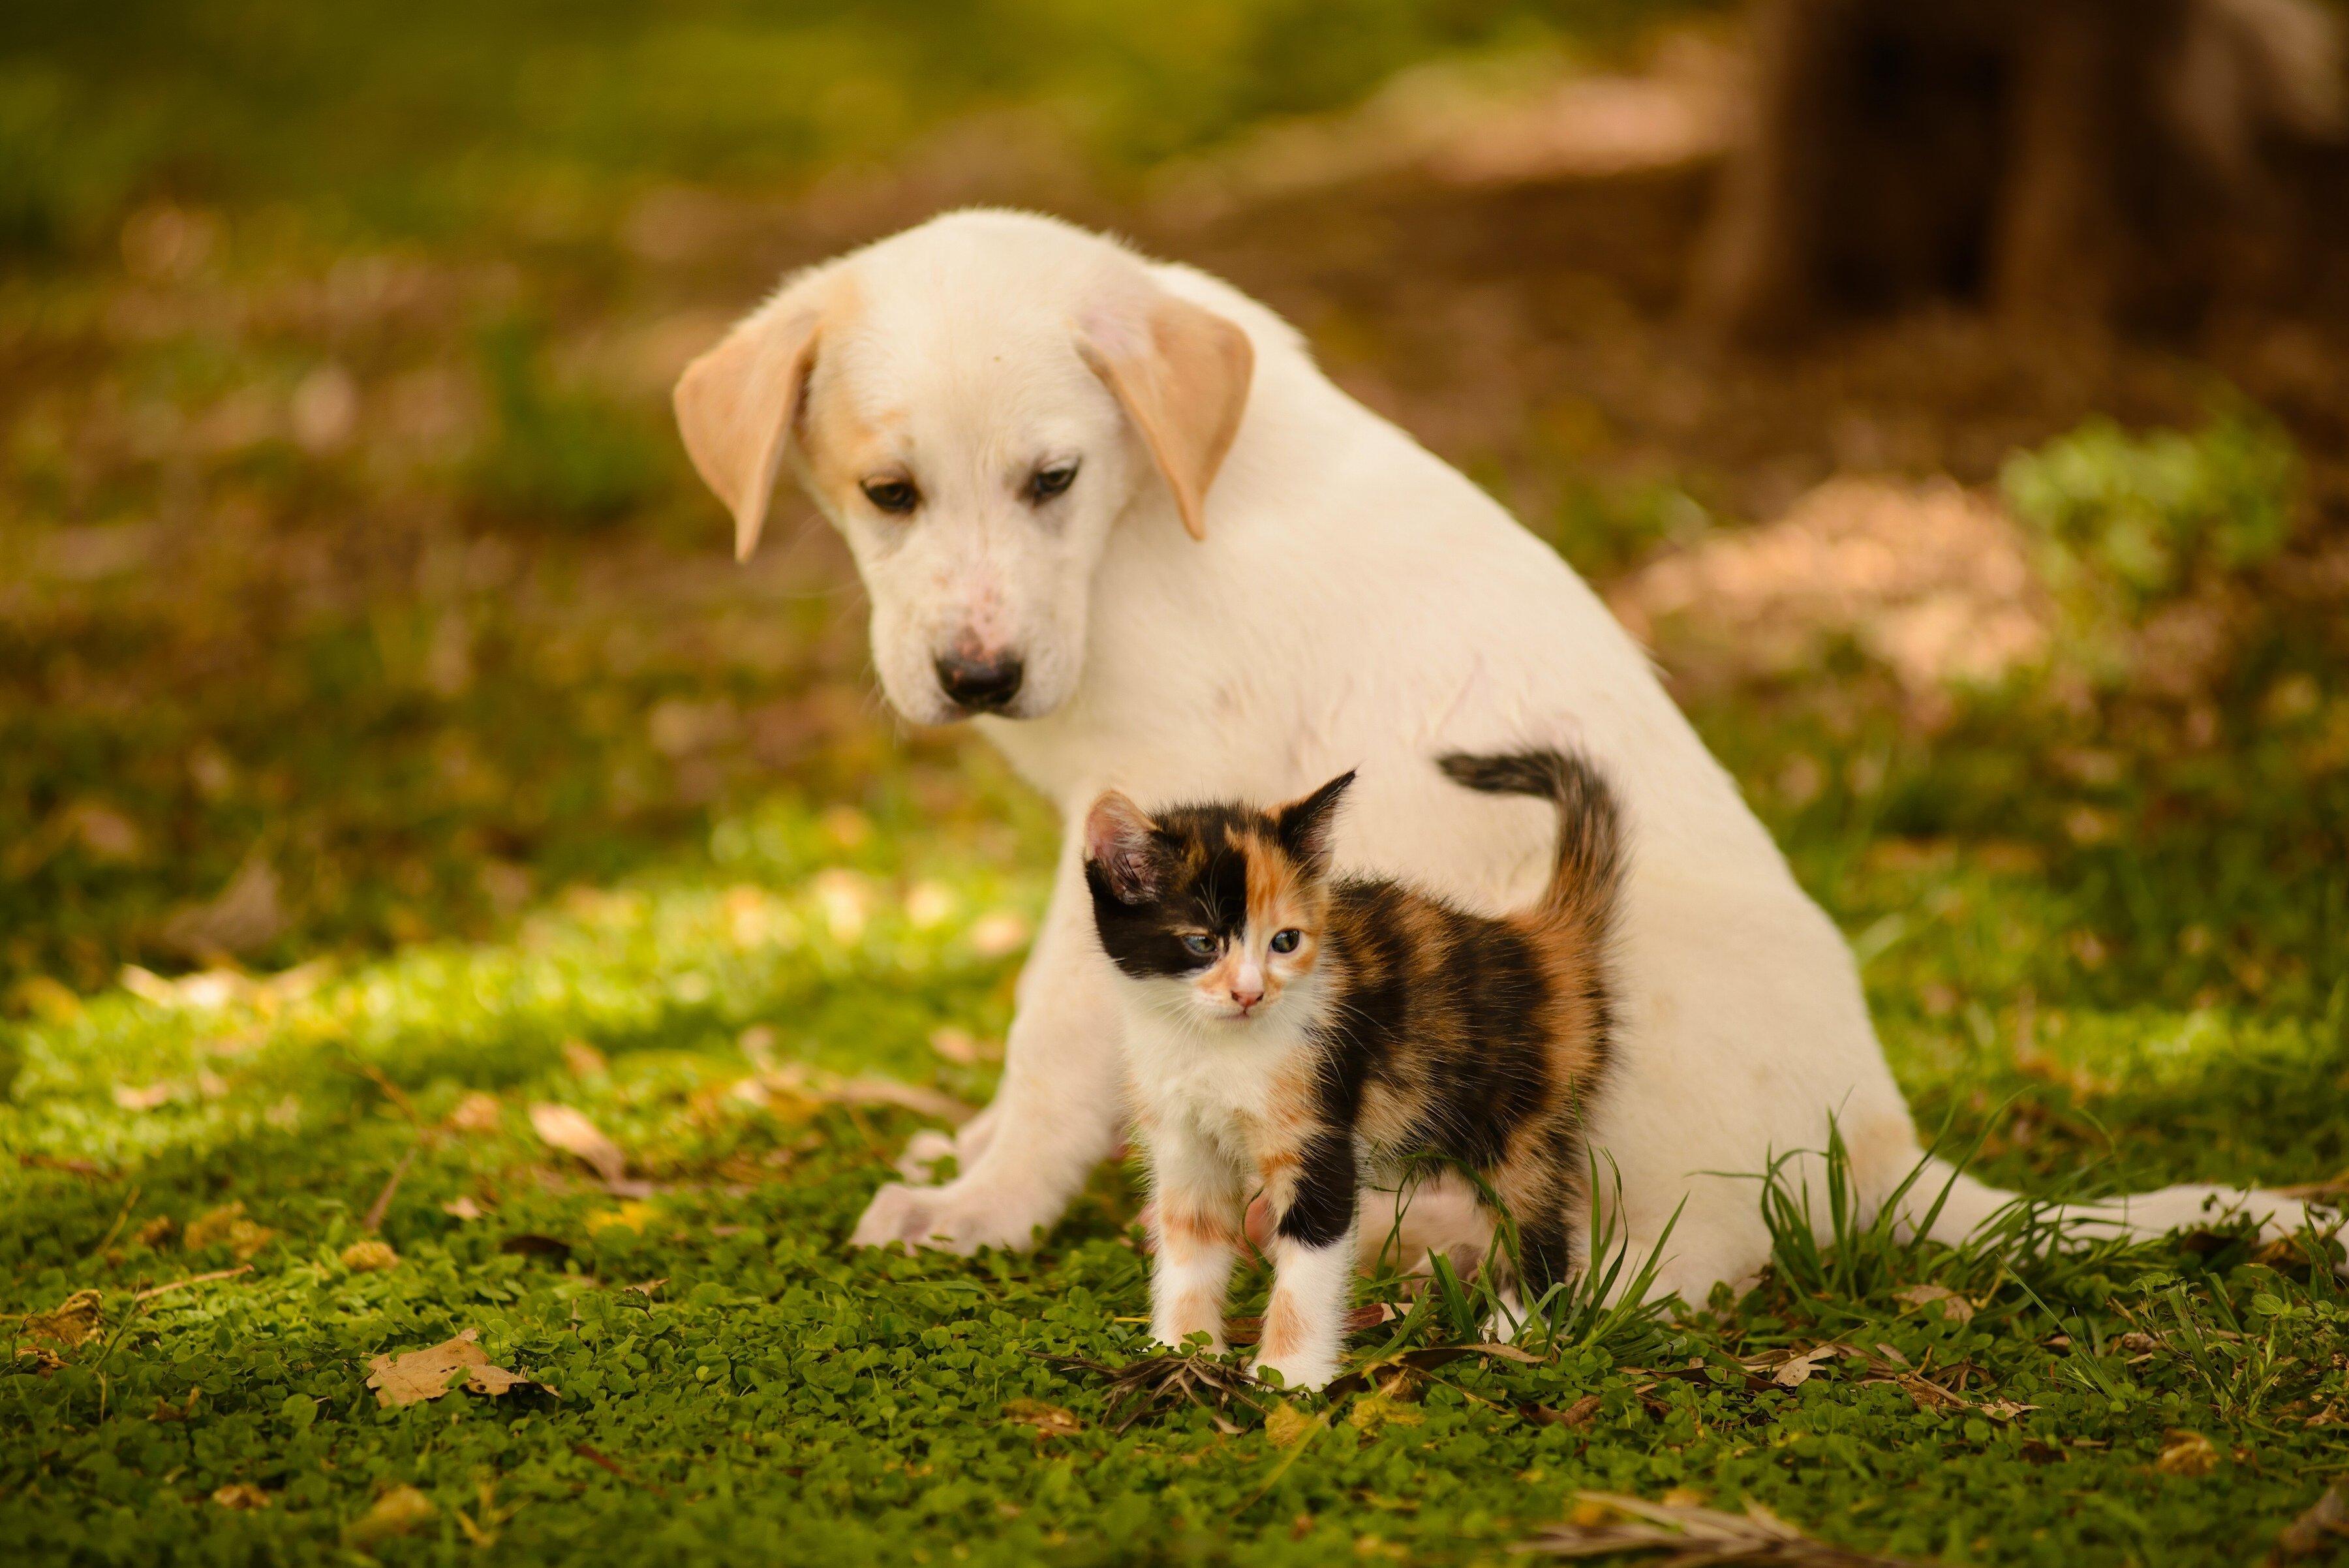 Dog Puppy Kitten Friends Baby Wallpaper 3600x2403 620688